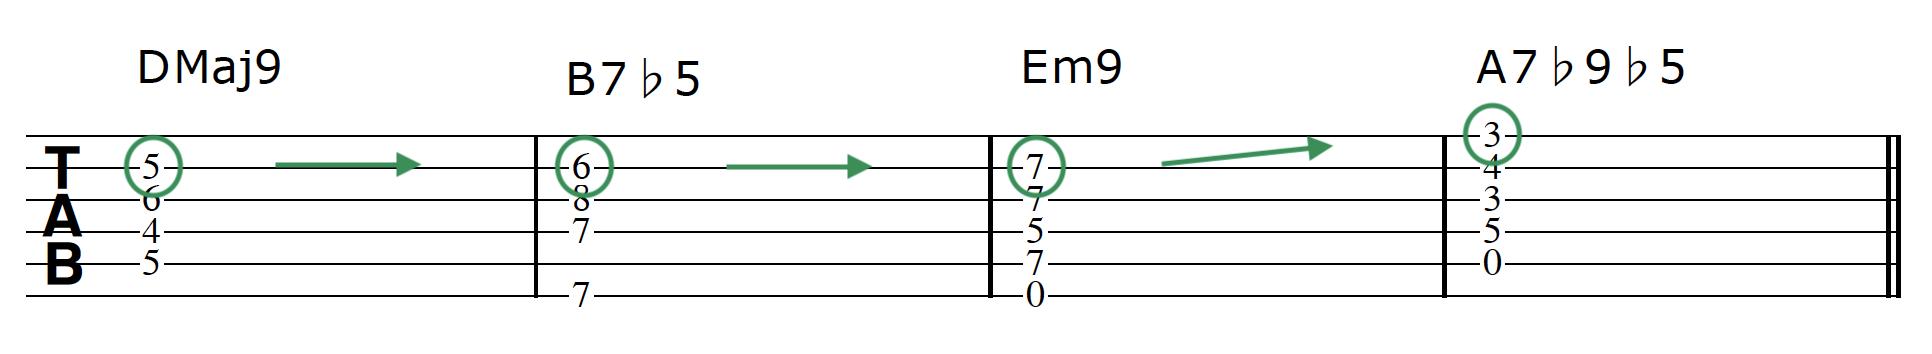 Advanced Guitar Chords Progression 1 Chord 4